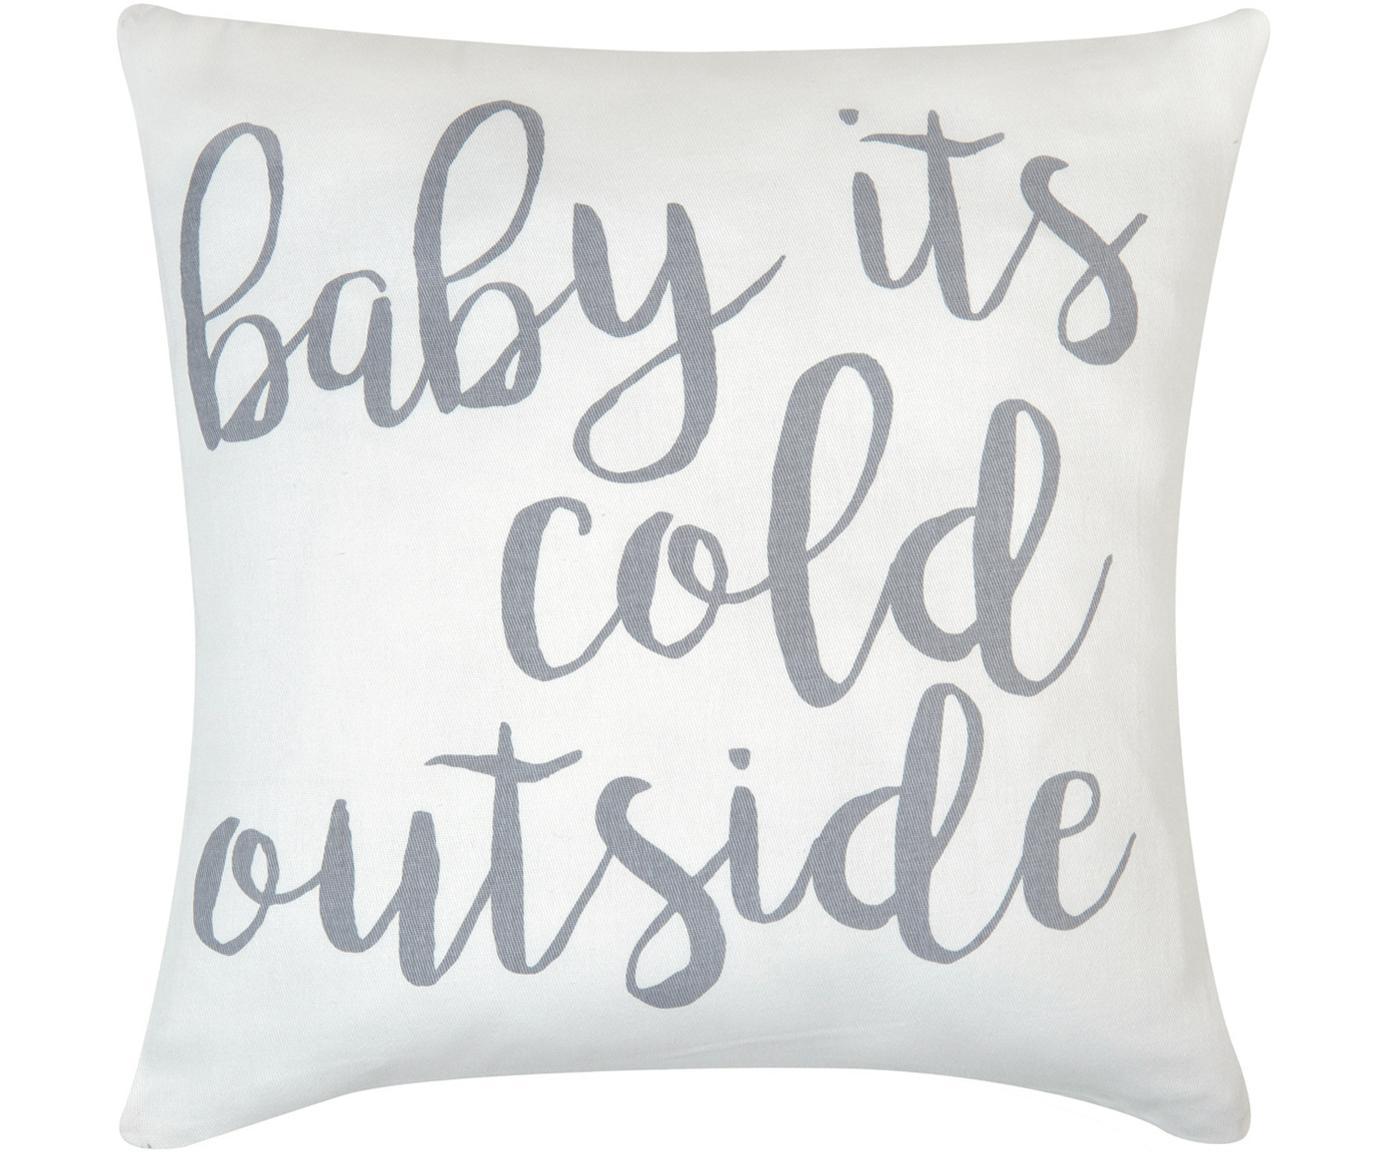 Kussenhoes Cold Outside, Katoen, panamabinding, Grijs, ecru, 40 x 40 cm